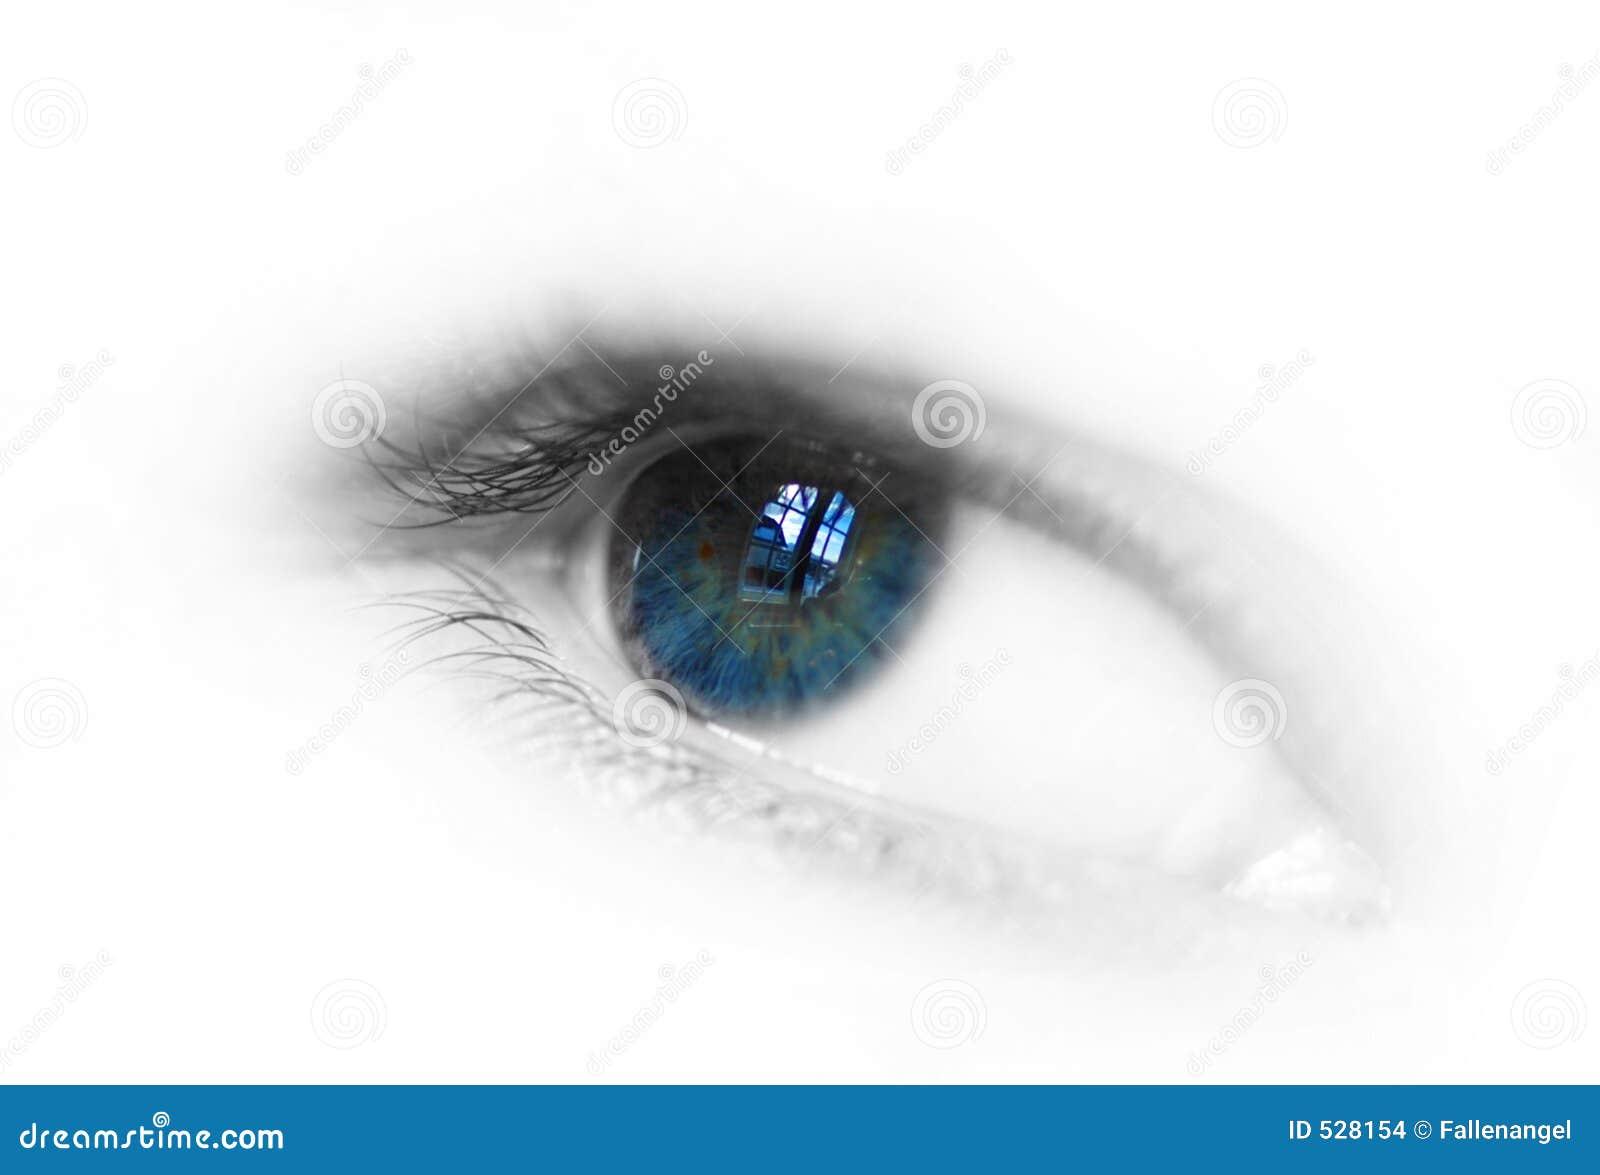 Download 眼睛 库存照片. 图片 包括有 反映, 艺术, 竹子, 颜色, 学生, 人们, 蓝色, 皮肤, 数字式, 眼睛 - 528154